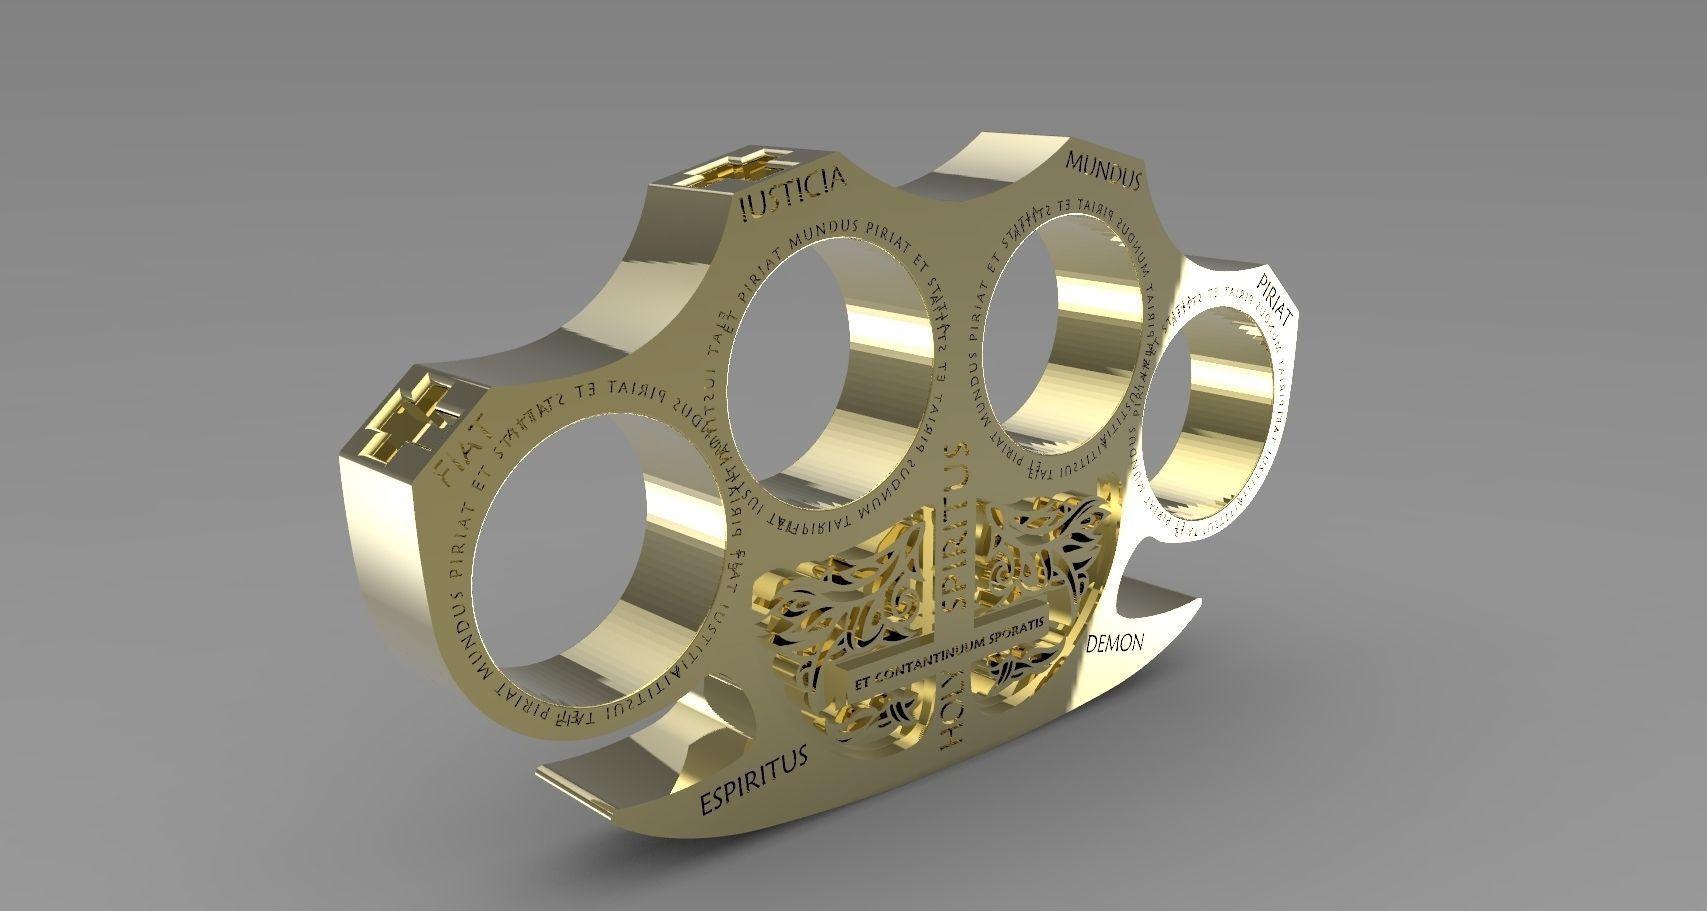 3d Printed Car Parts >> Holy Brass Knuckles 3D Model 3D printable STL - CGTrader.com